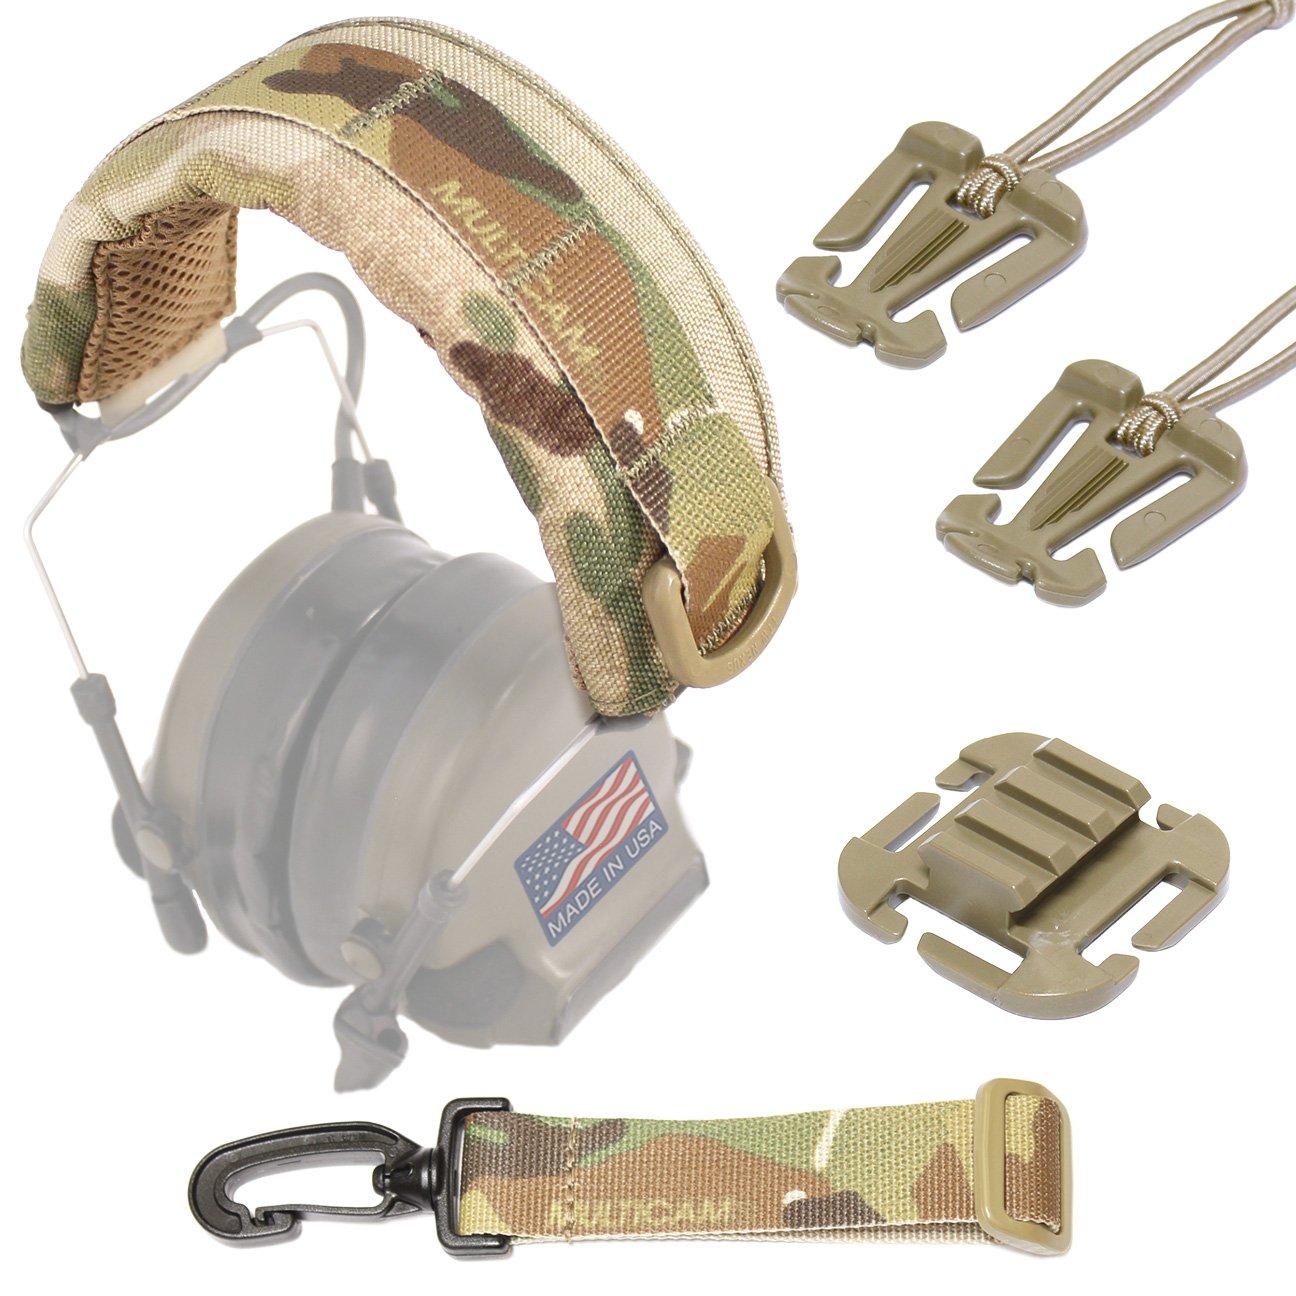 USTs Advancedモジュラー型ヘッドセットカバー B010KOPGEU Multicam + Accessory Bundle Multicam + Accessory Bundle